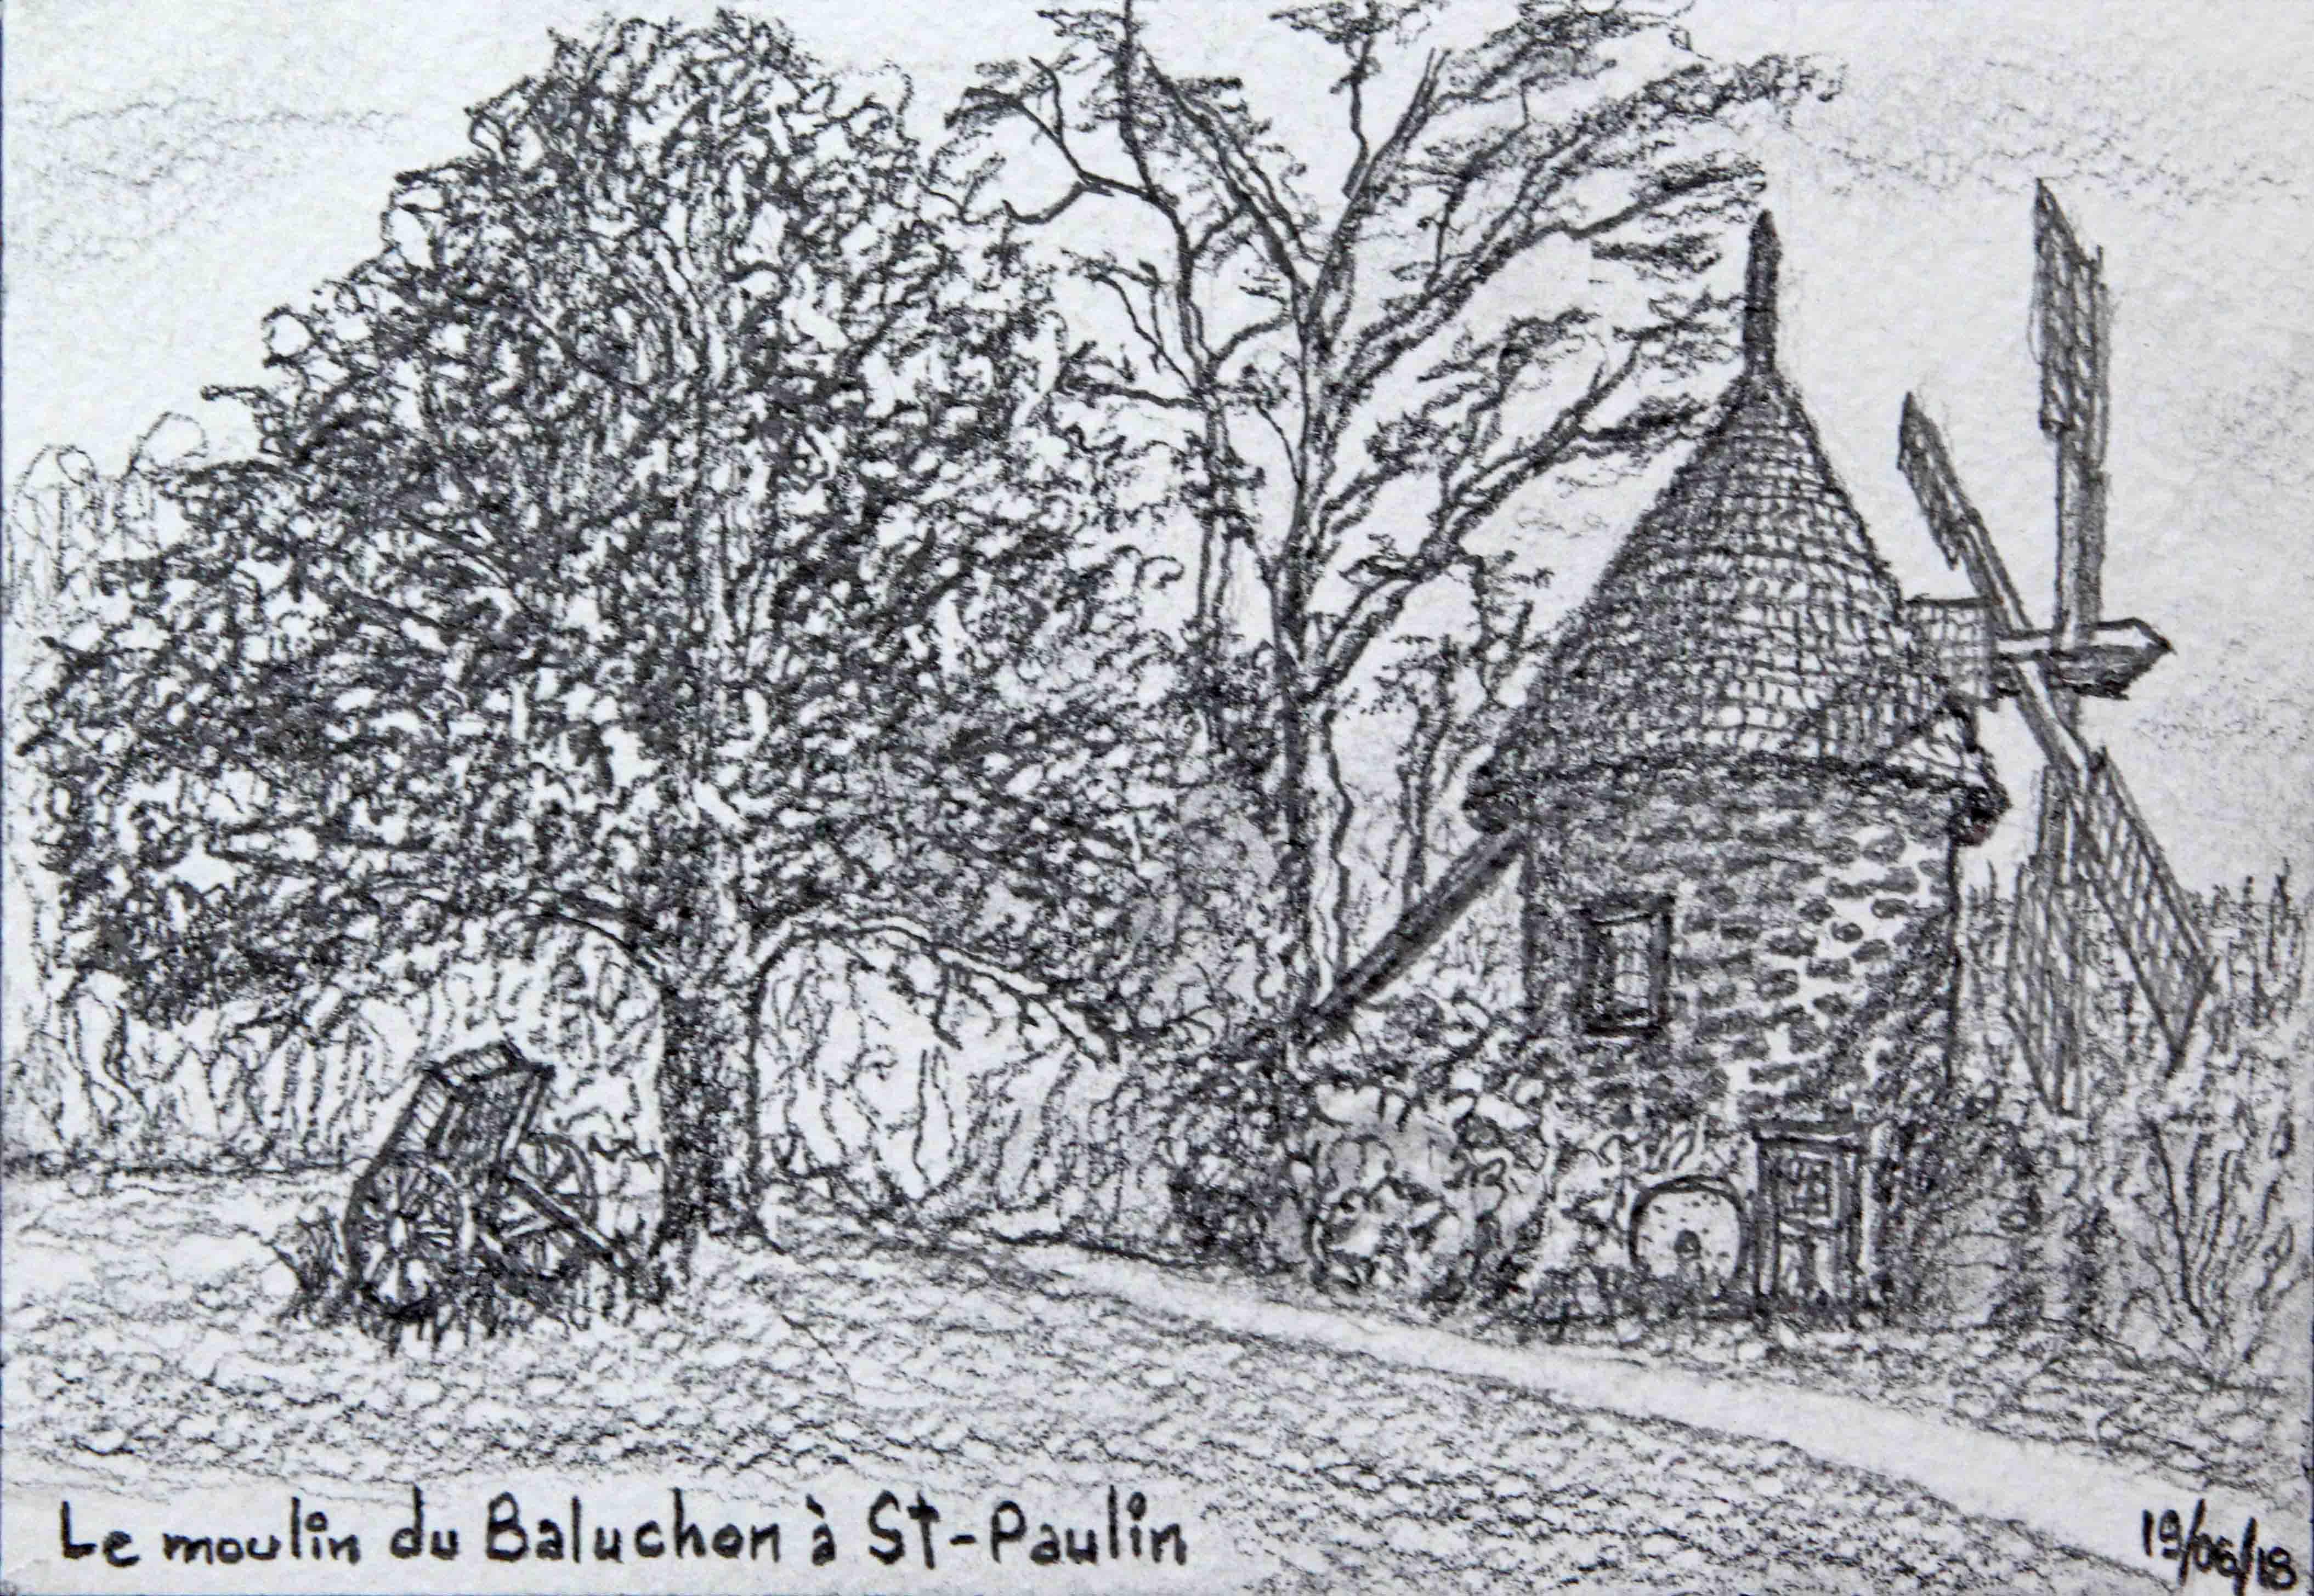 D33 Moulin du Baluchon St-Paulin